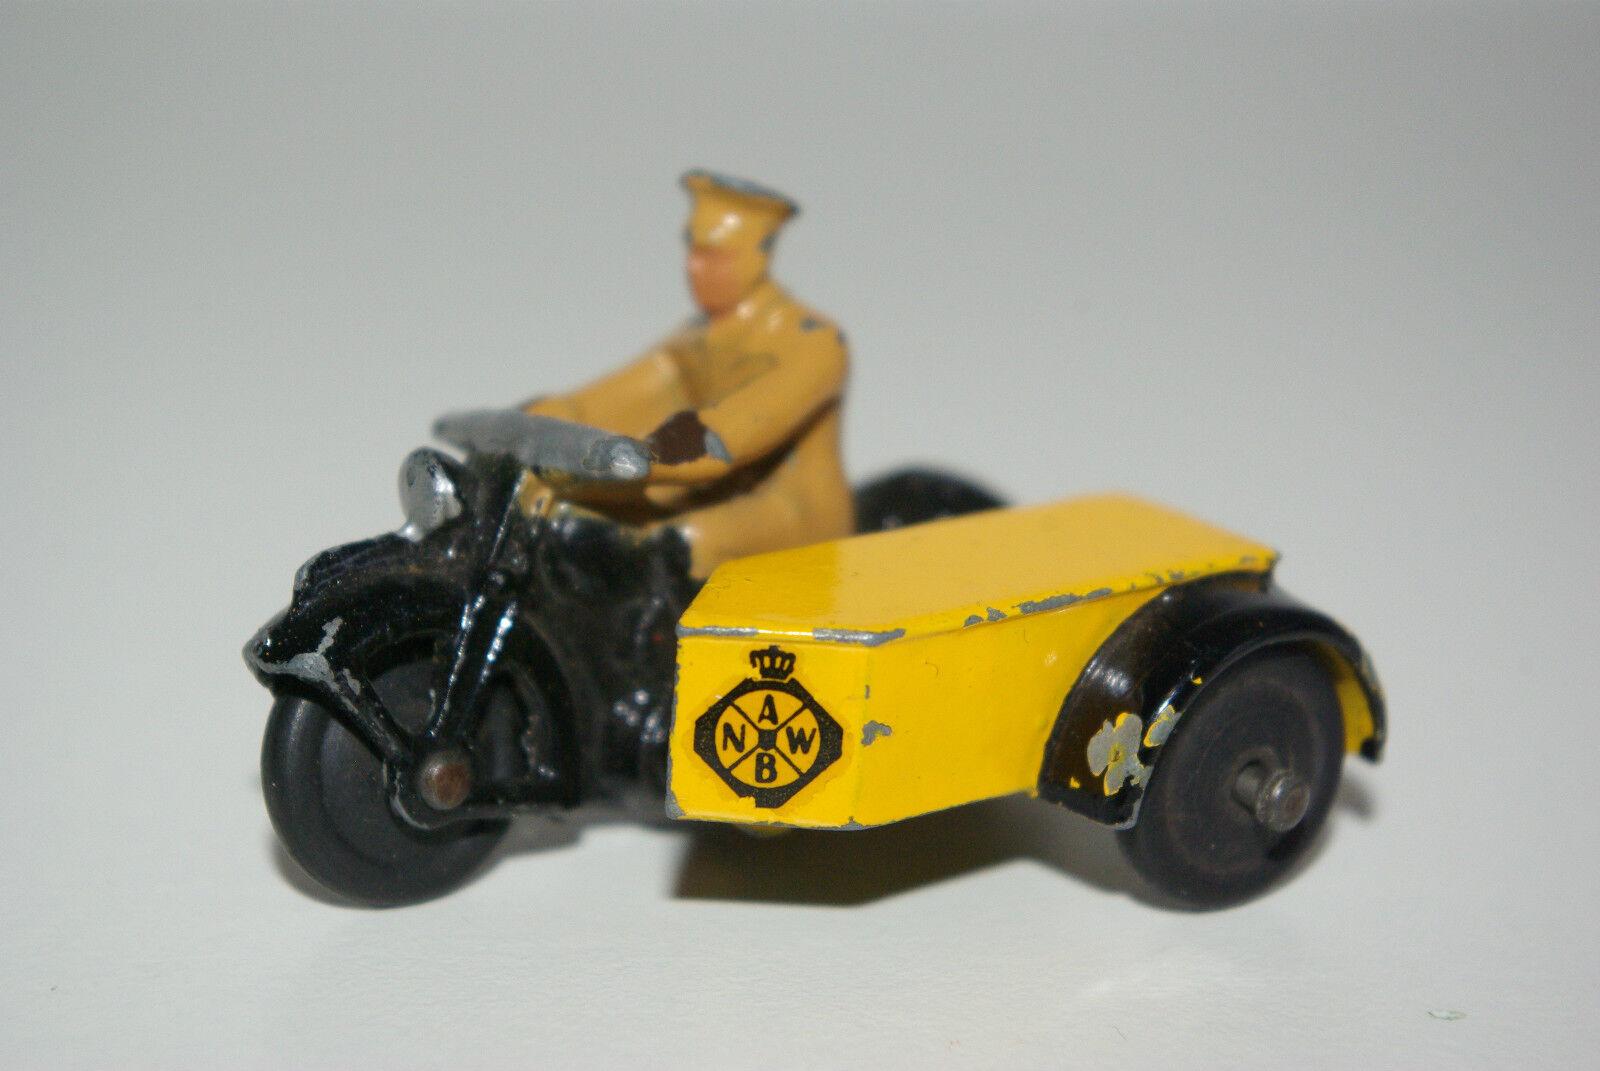 cómodamente Dinky Juguetes 44b 44b 44b 44 B motor cycle with sideCoche ANWB Dutch AA excellent Rare  en stock